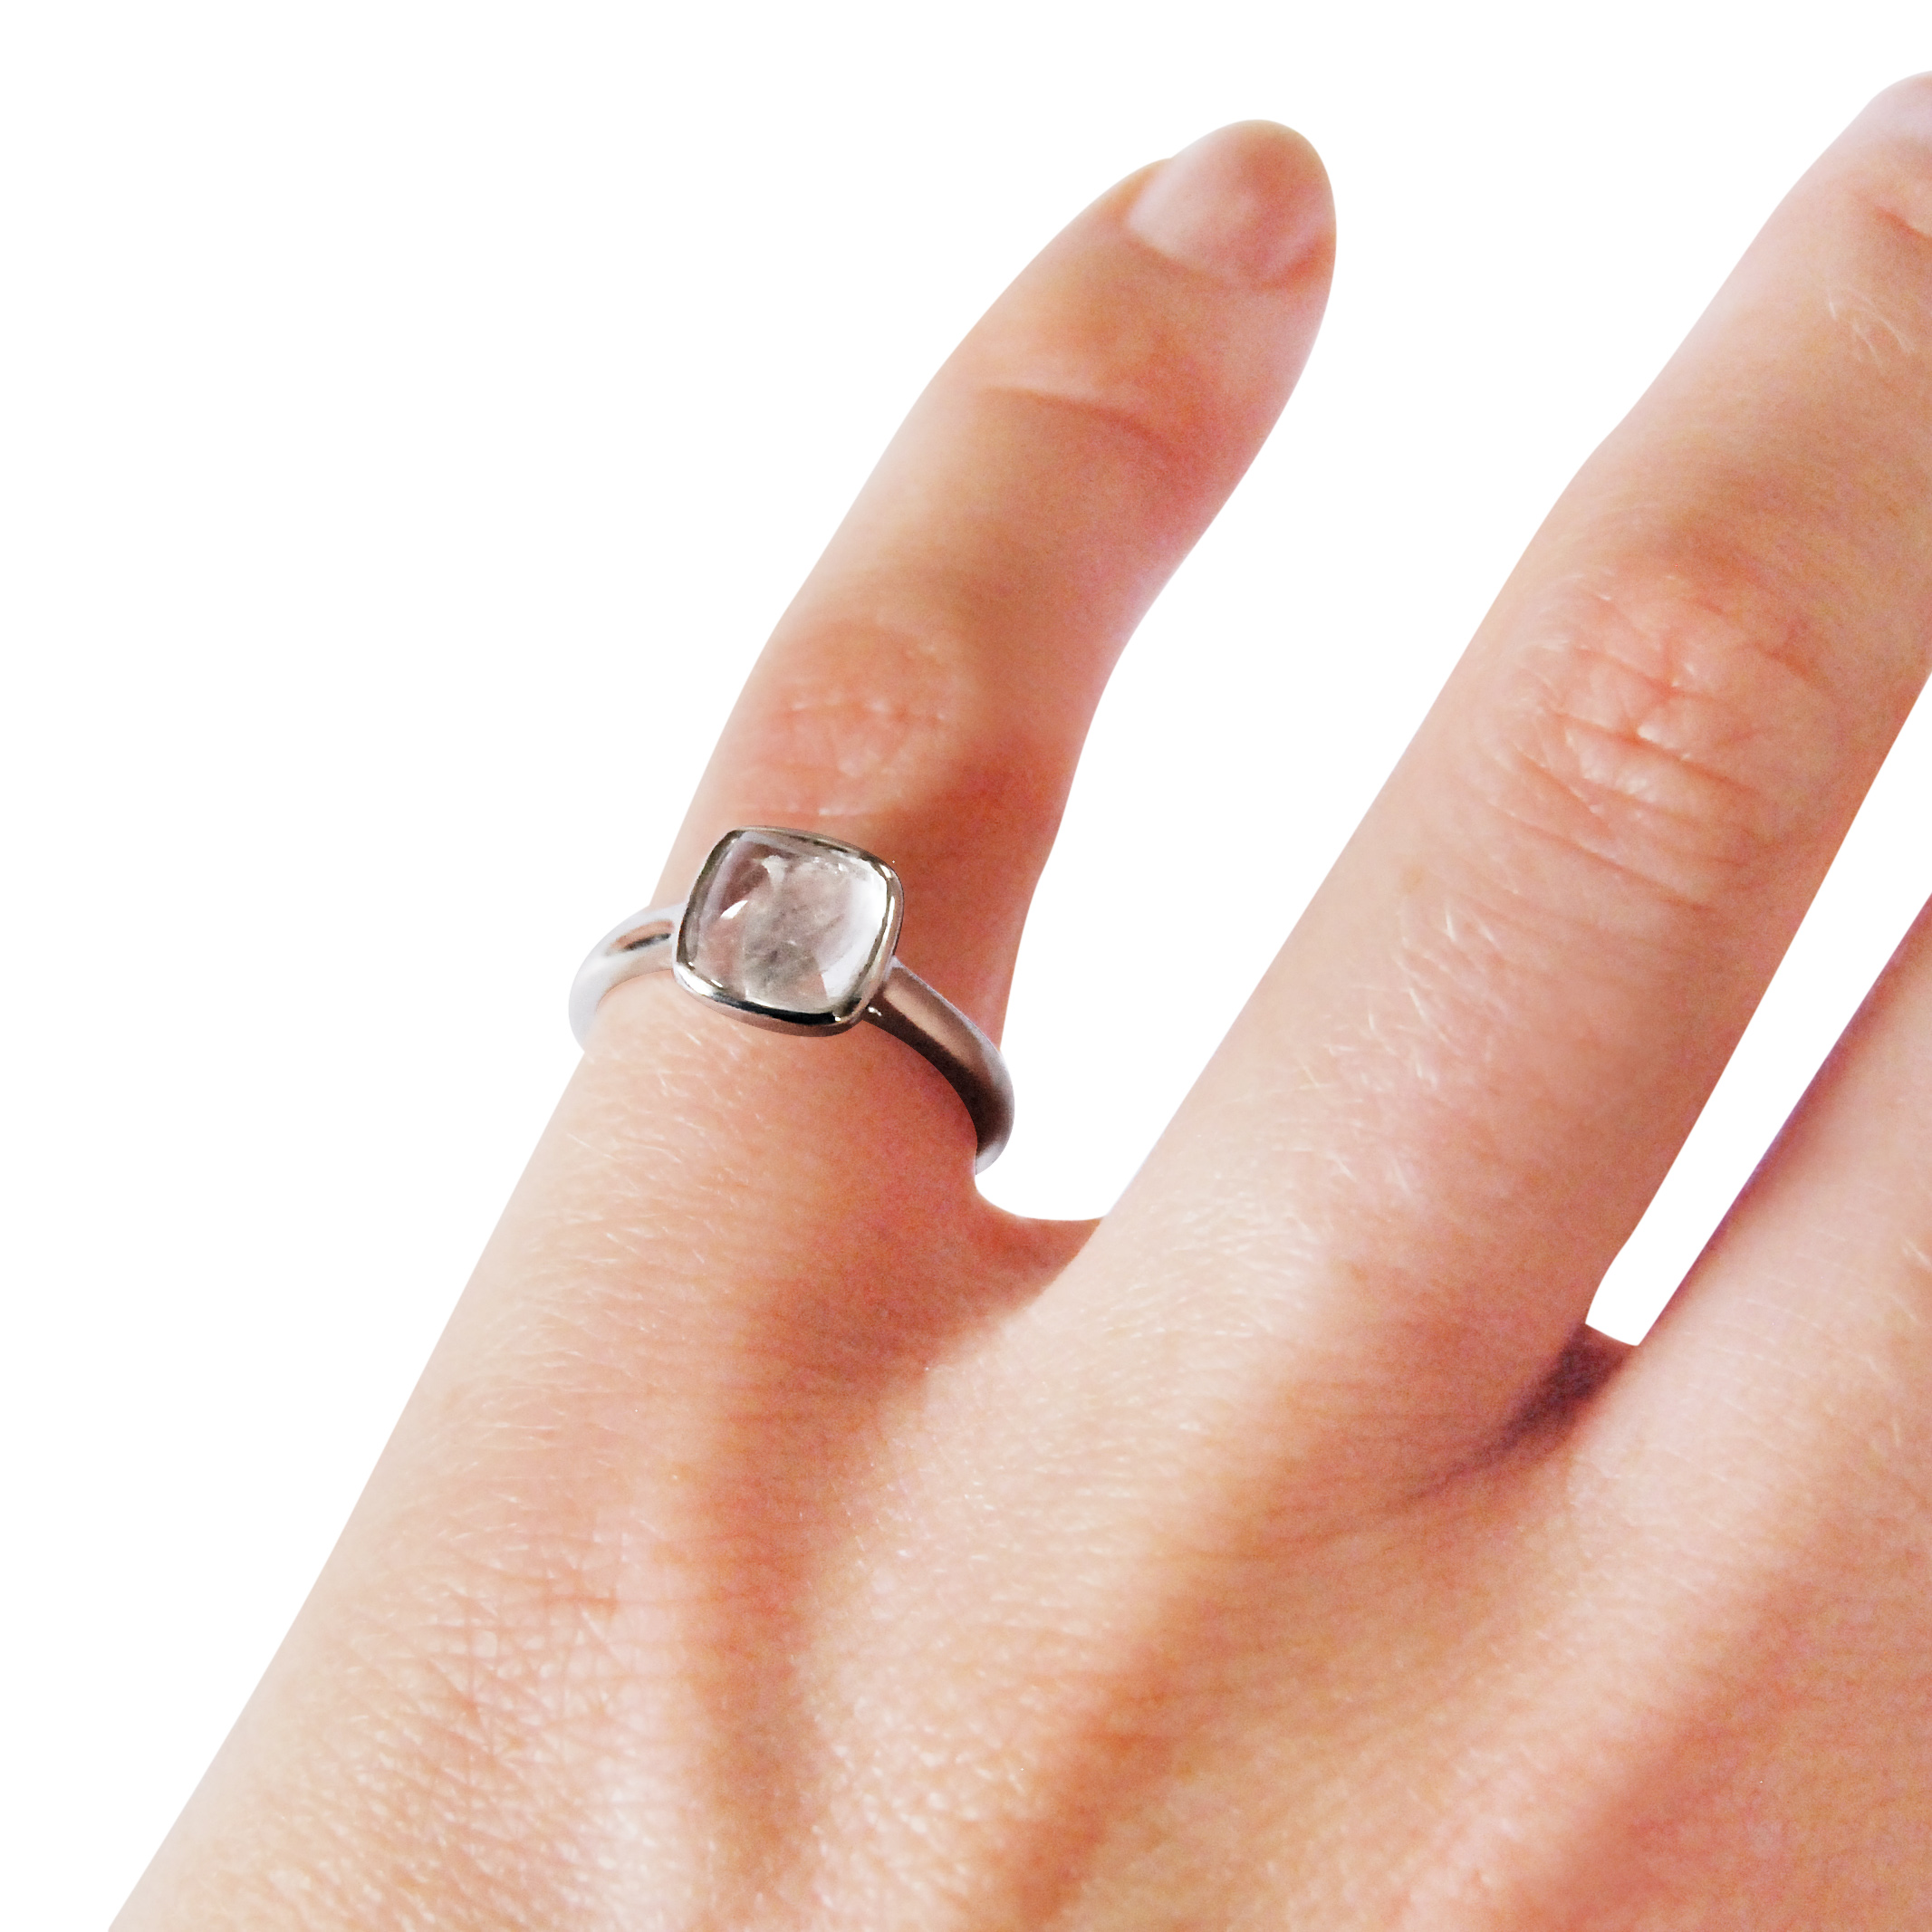 Flourite-18ct white-gold -engagement-ring.jpg